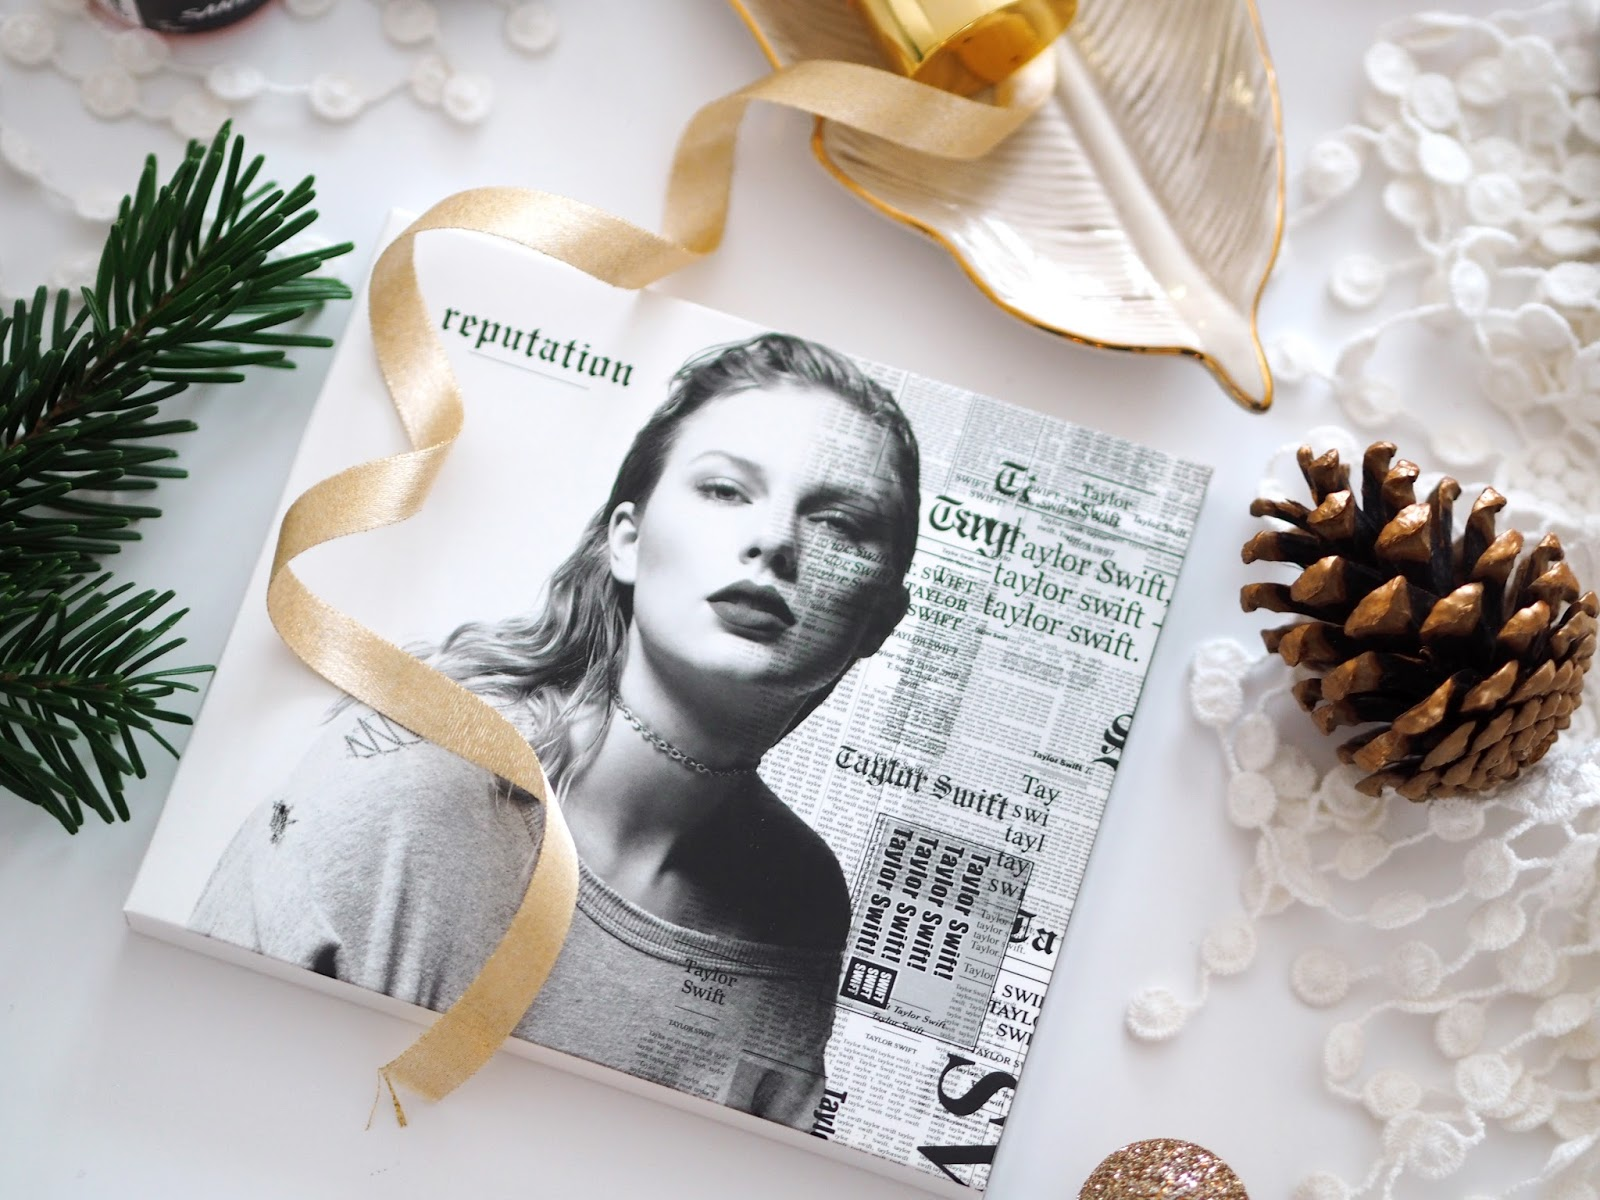 Loves List: December, Katie Kirk Loves, UK Blogger, West Sussex Blogger, Lifestyle Blogger, Beauty Blogger, Fashion Blogger, Bio Essence 24K Gold Miracle Finisher, Stila Cosmetics, Stila Cosmetics Glitter Eyes, Lush Cosmetics, Yankee Candle Christmas Eve, Nails Inc, Nails Inc Dirty Unicorns, Unicorn Nail Polish, Taylor Swift Taylor Swift Reputation Album, Blogger Loves, Blogger Favourites